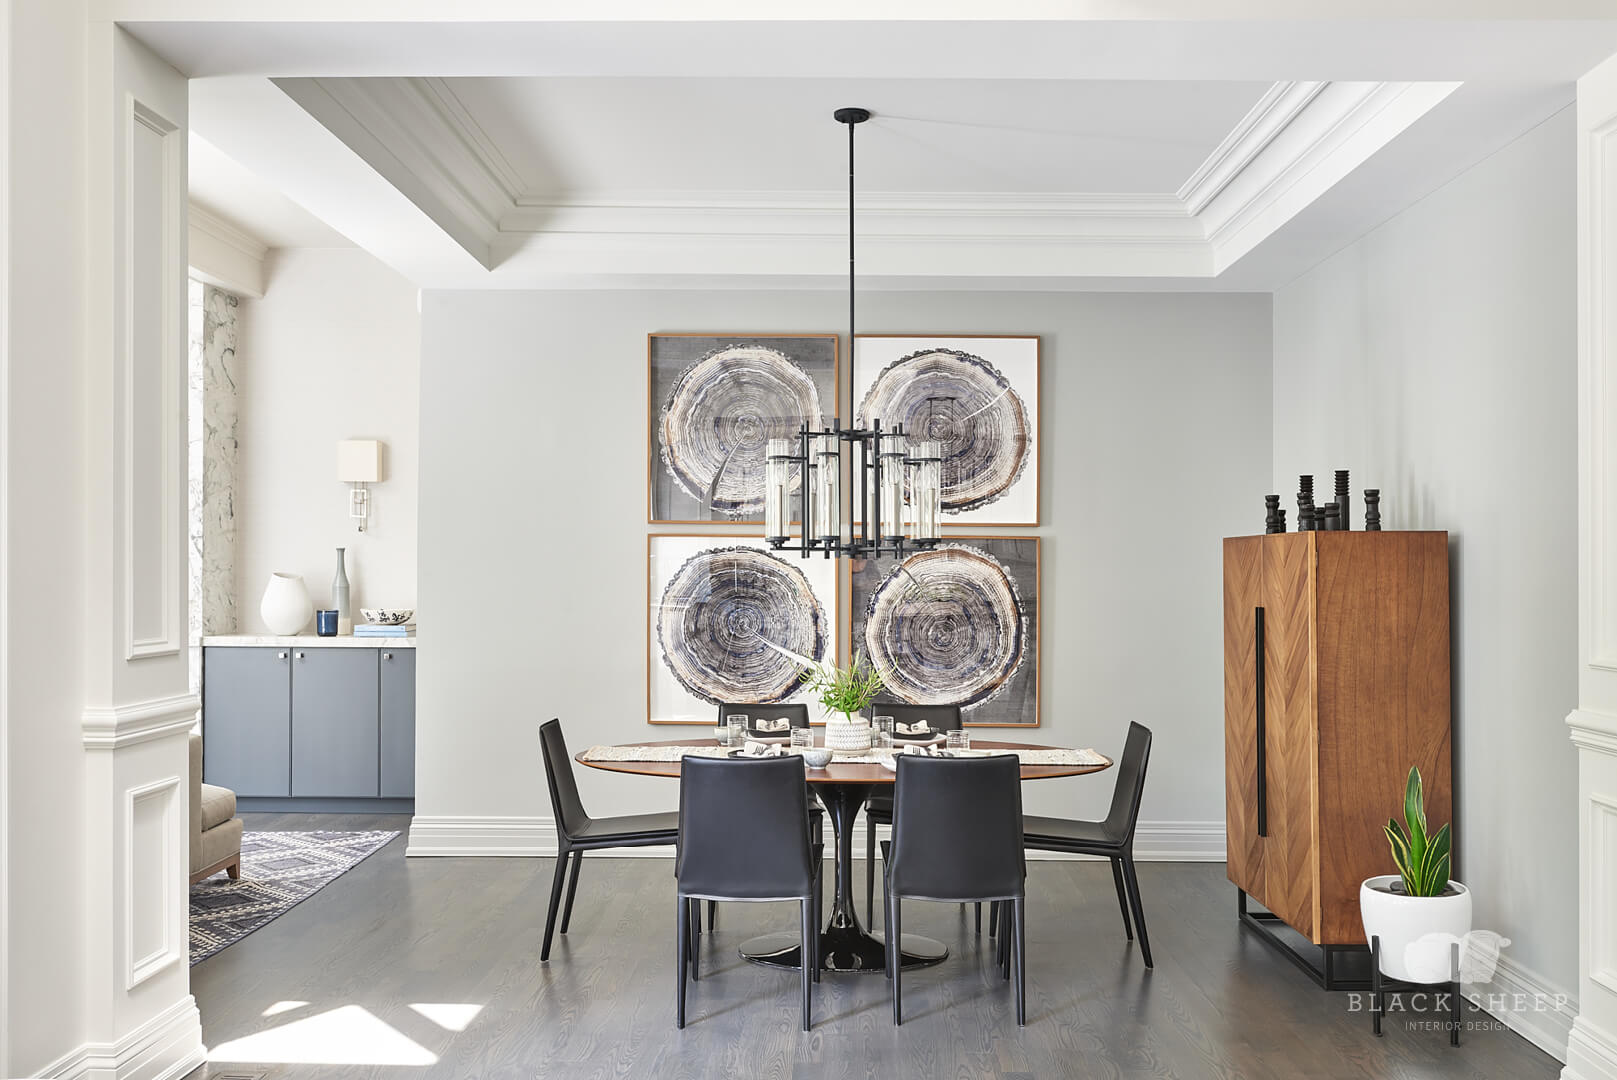 Black Sheep Interior Design - St Leonard 13